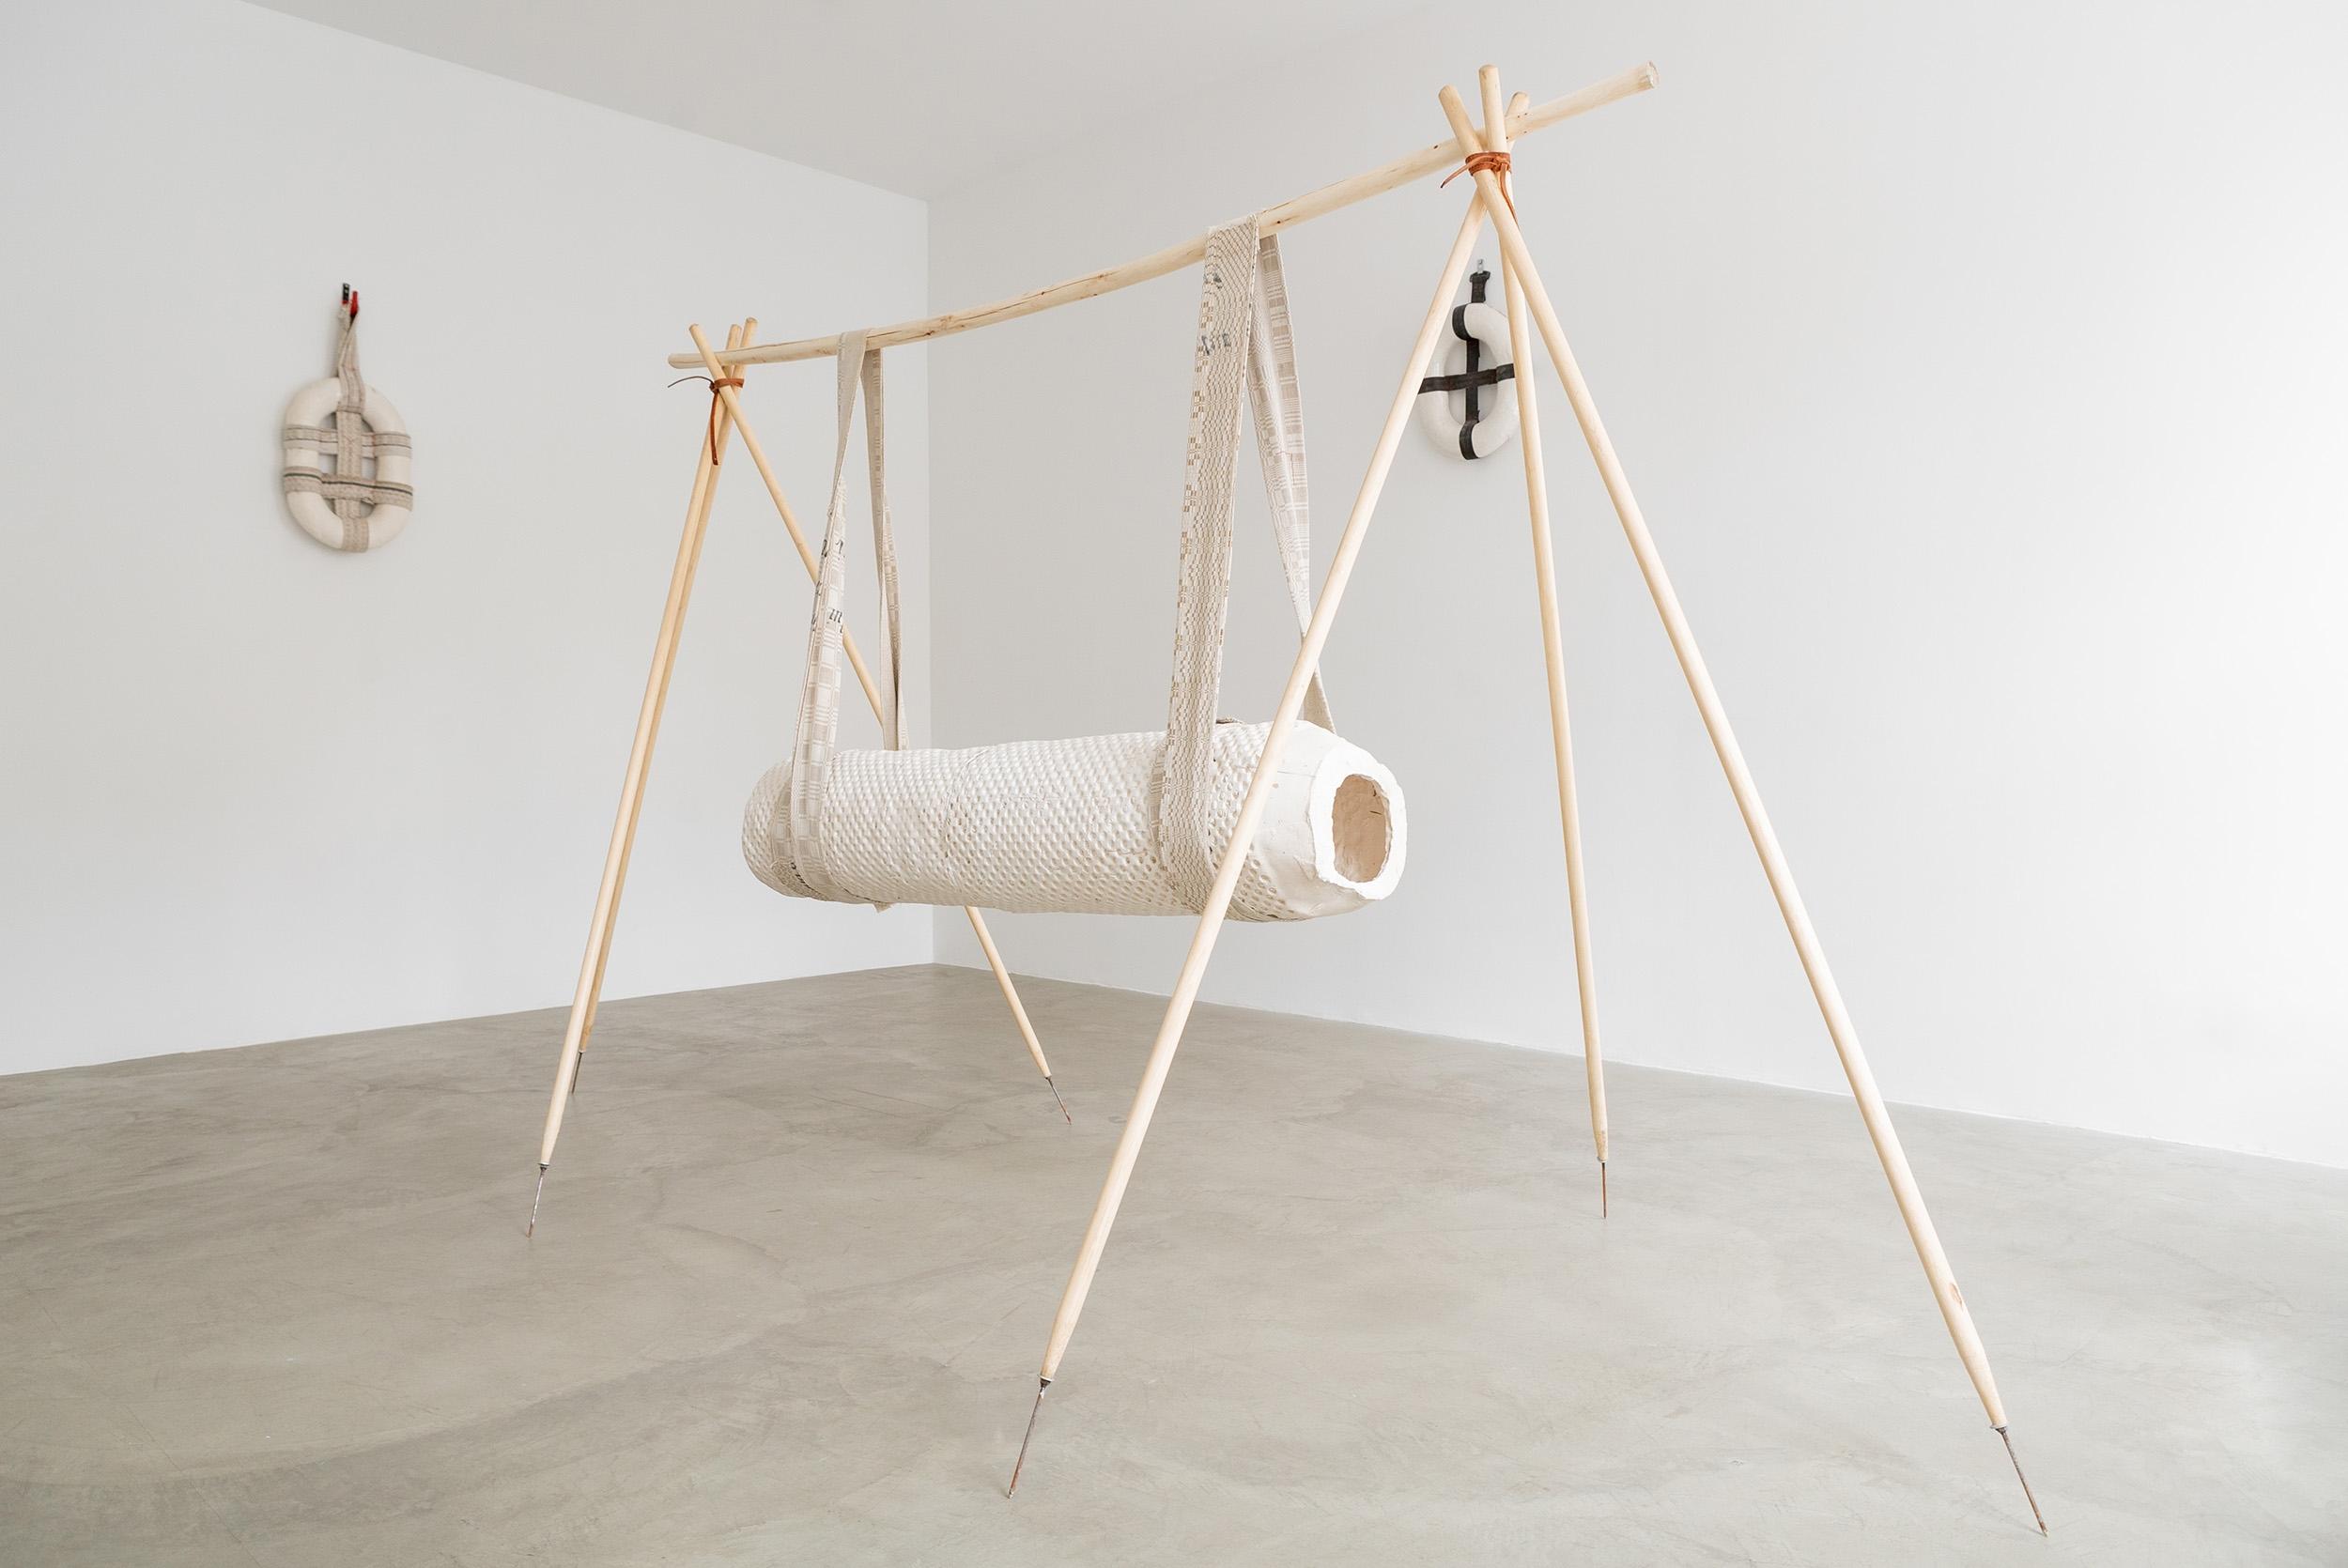 [EN/LT] 'China' by Mindaugas Navakas at AV17 Gallery